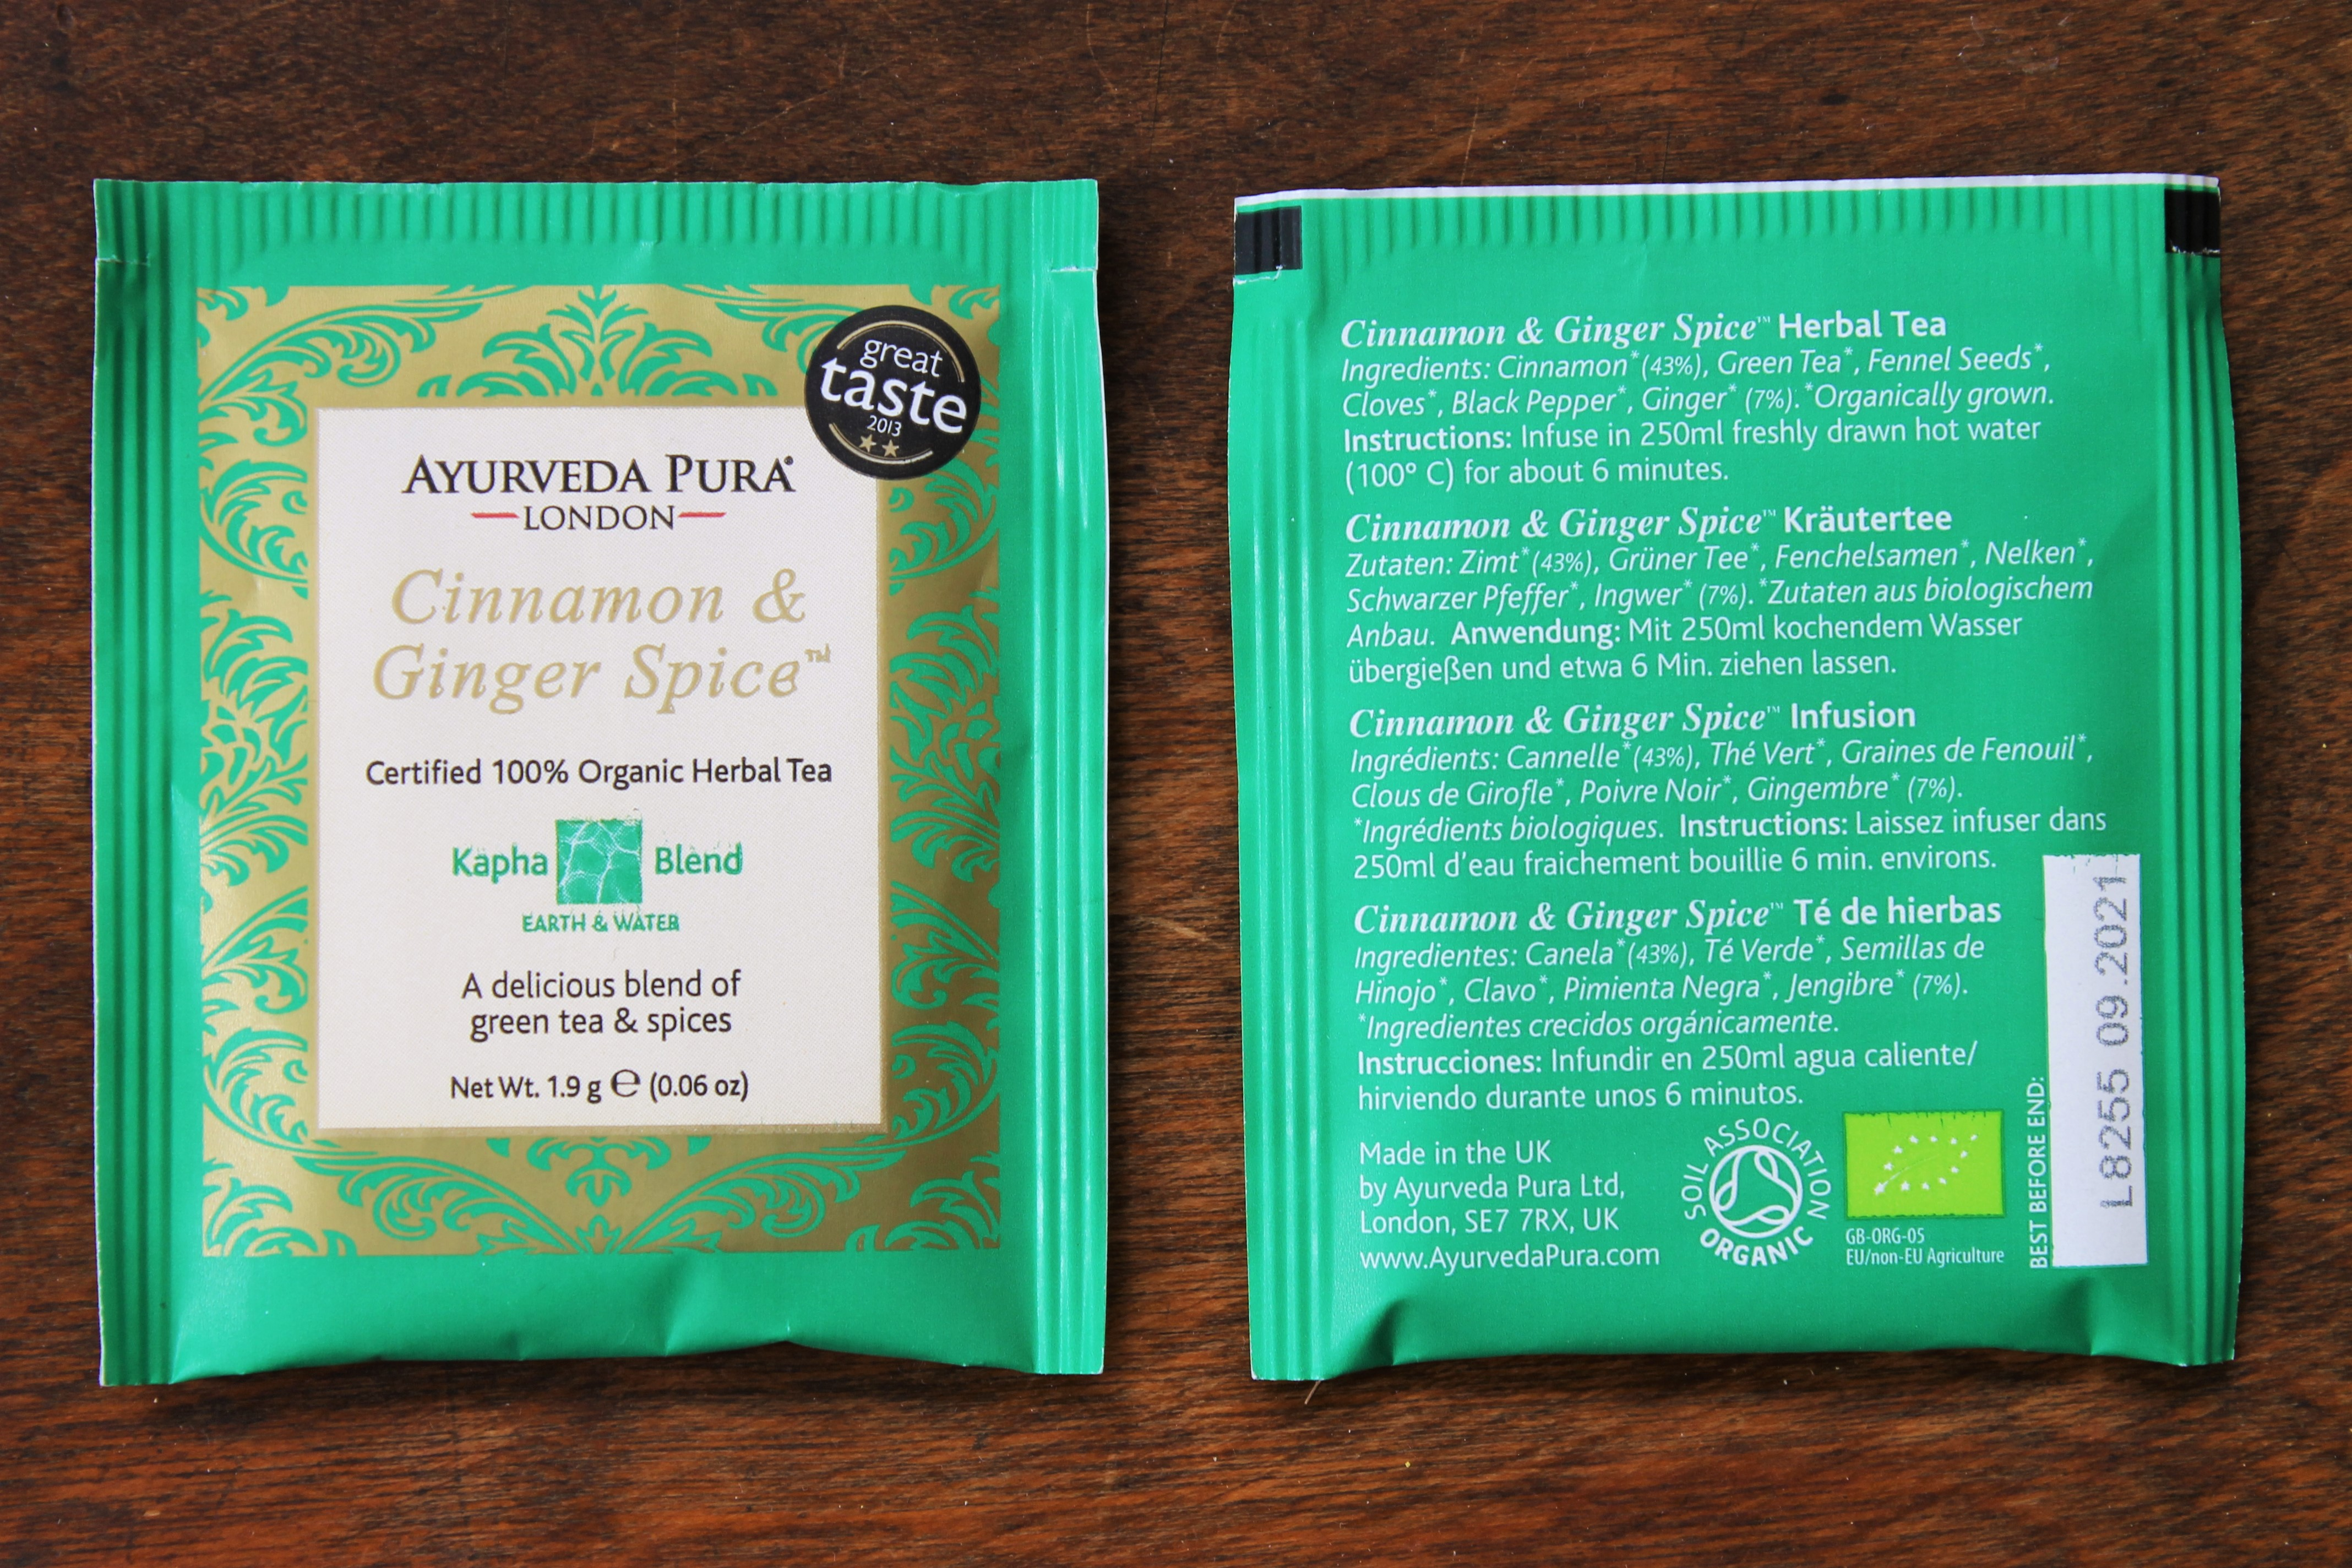 cinnamon ginger spice ayurvedic tea